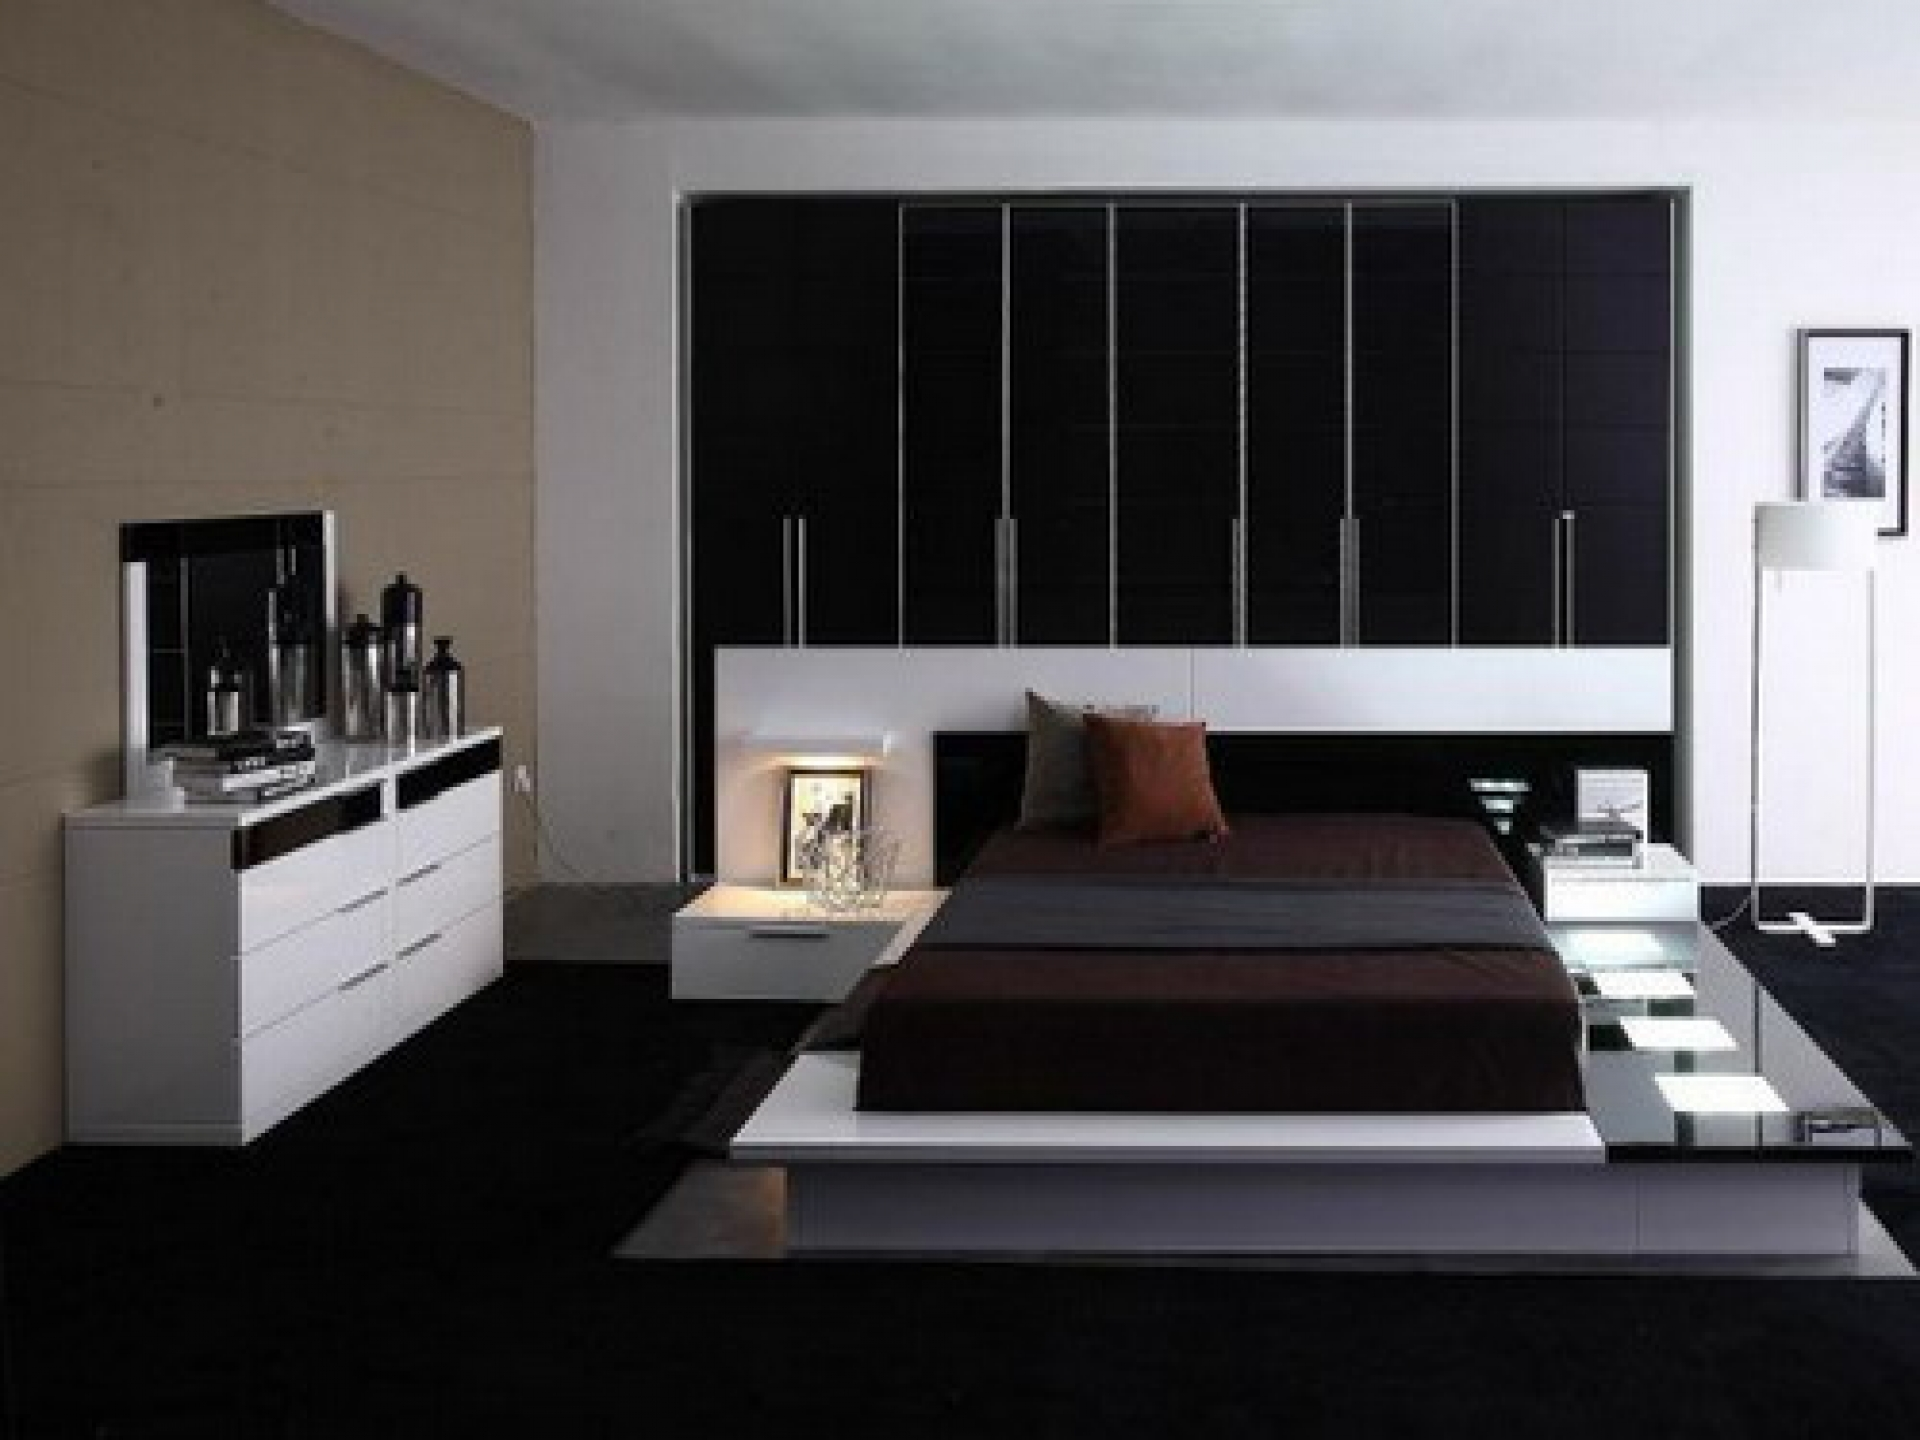 bedroom-simple-contemporary-bedroom-design-ideas-2015-with-picturesque-bedroom-interior-decorating-ideas-contemporary-bedroom-design-ideas-2015-bedroom-set-furniture-kids-bedroom-interior